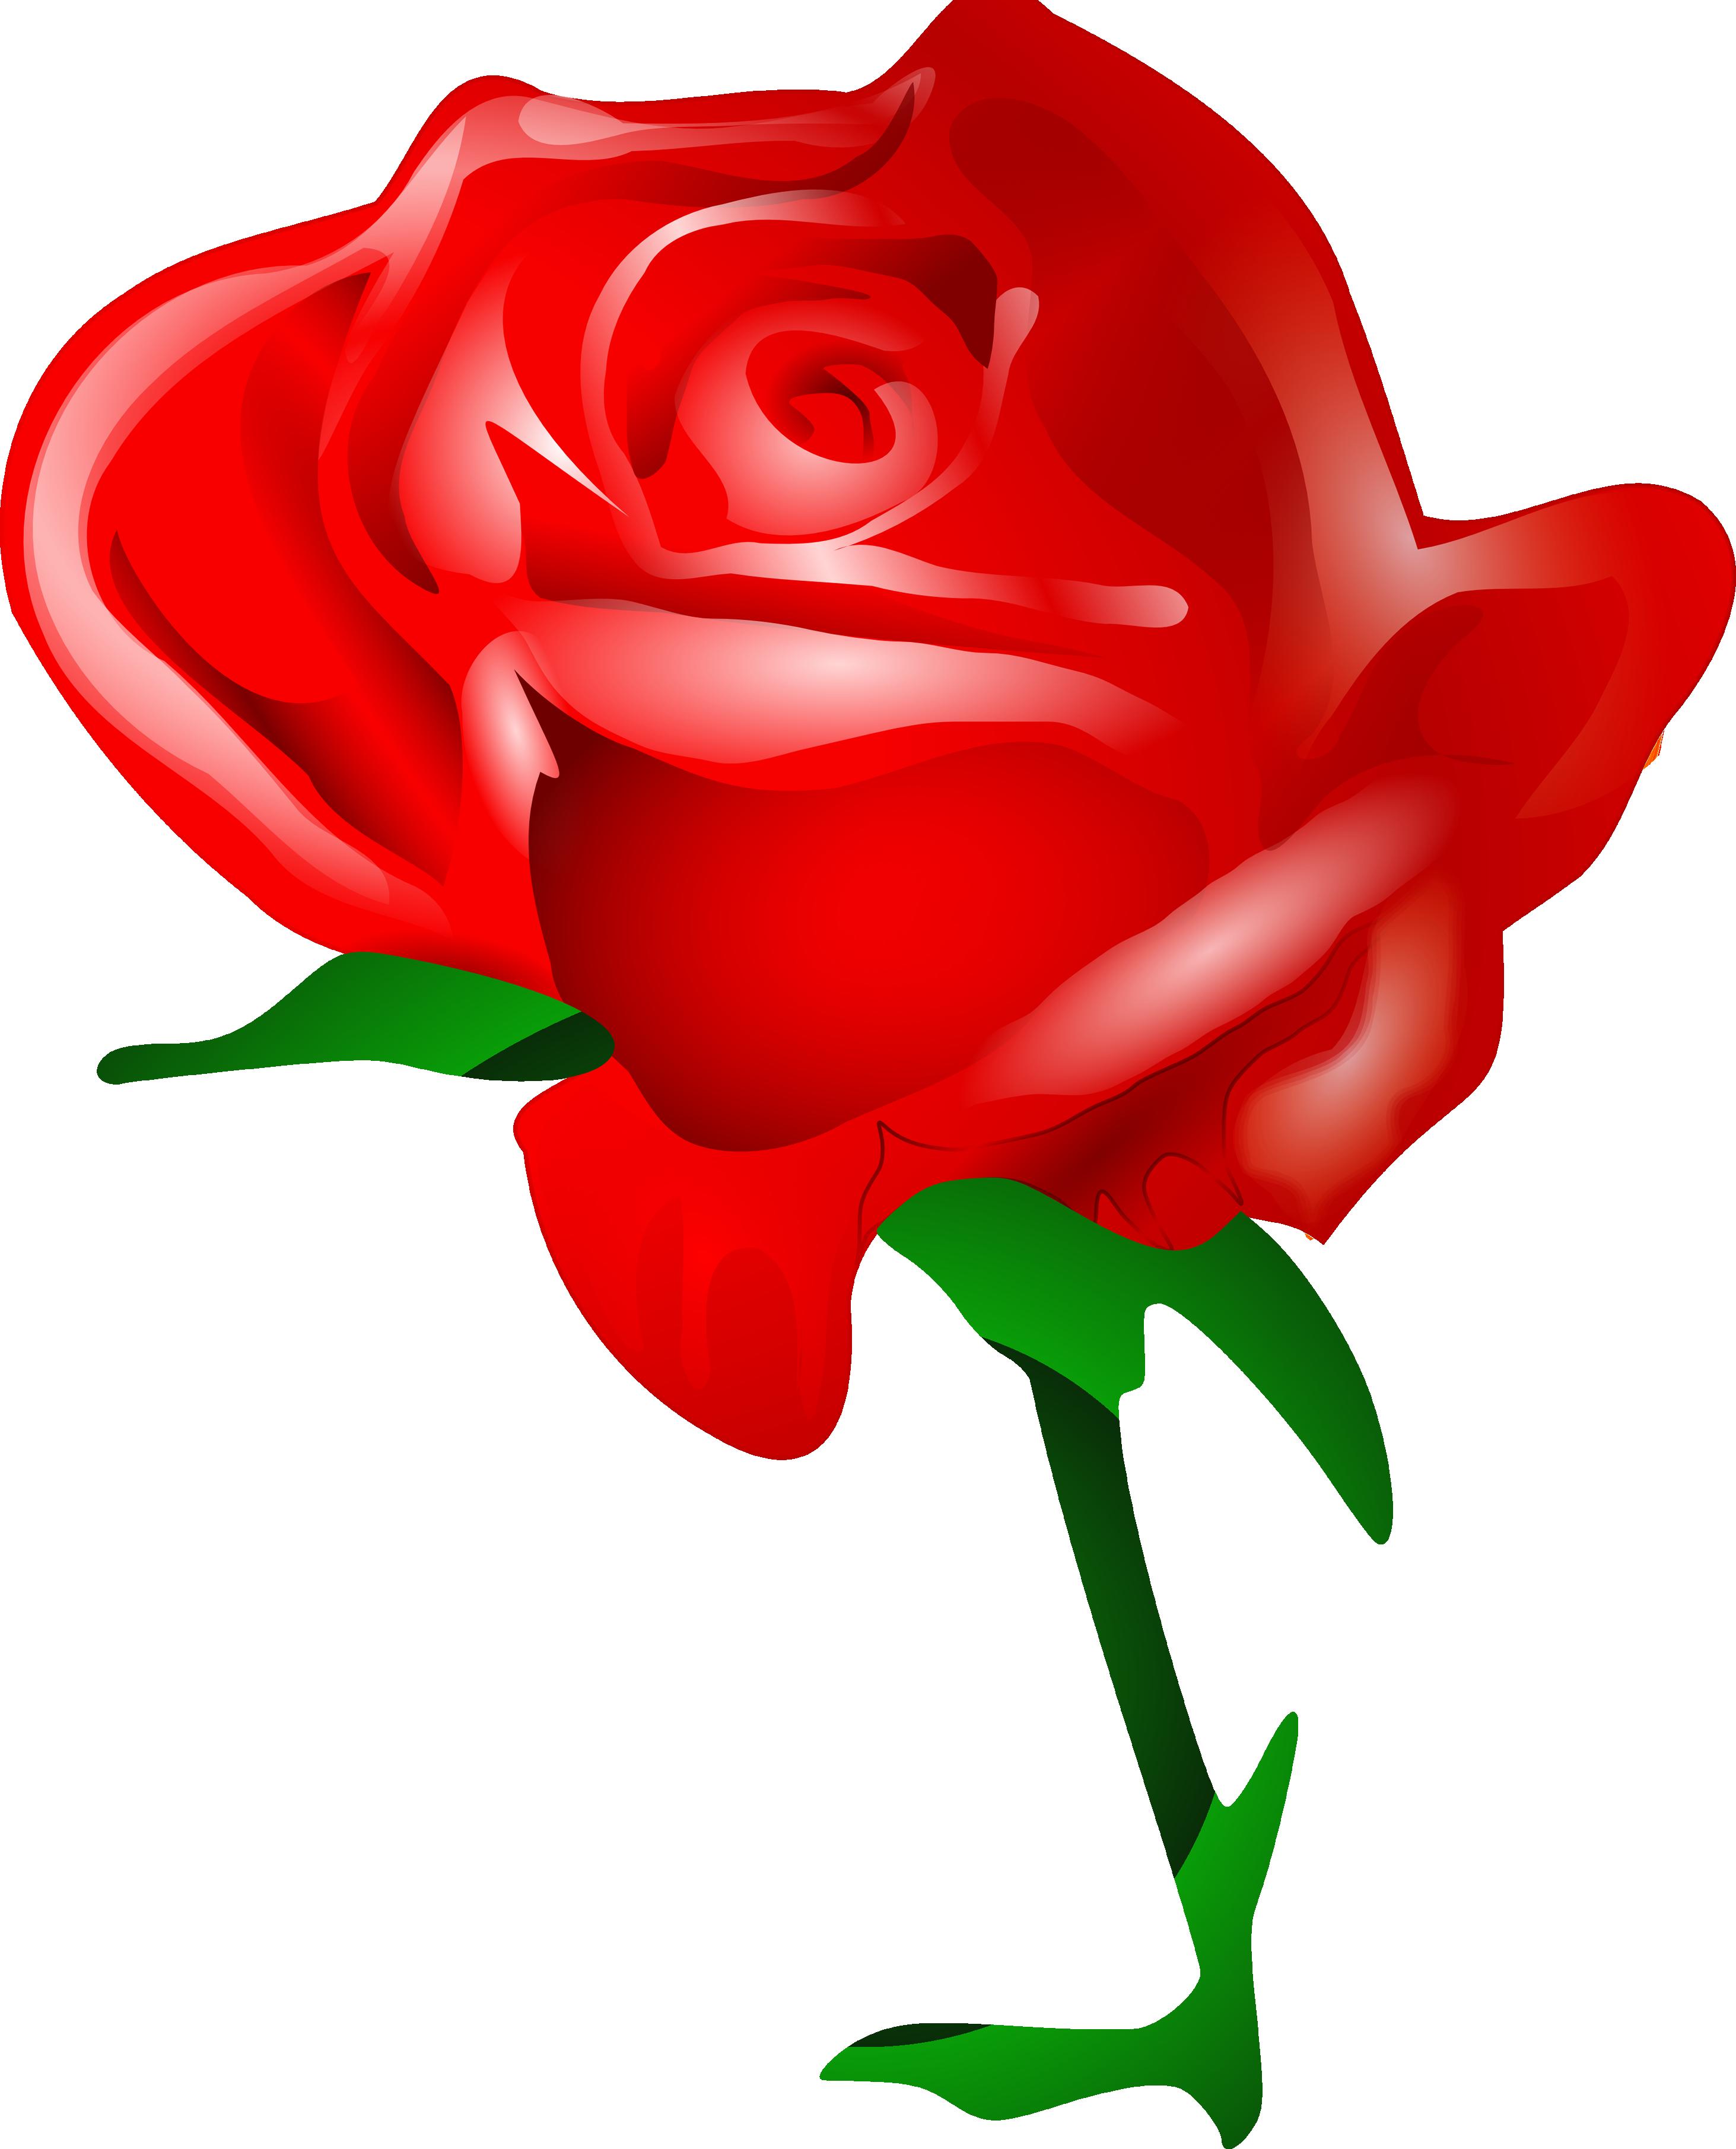 Rose PNG flower images, free download